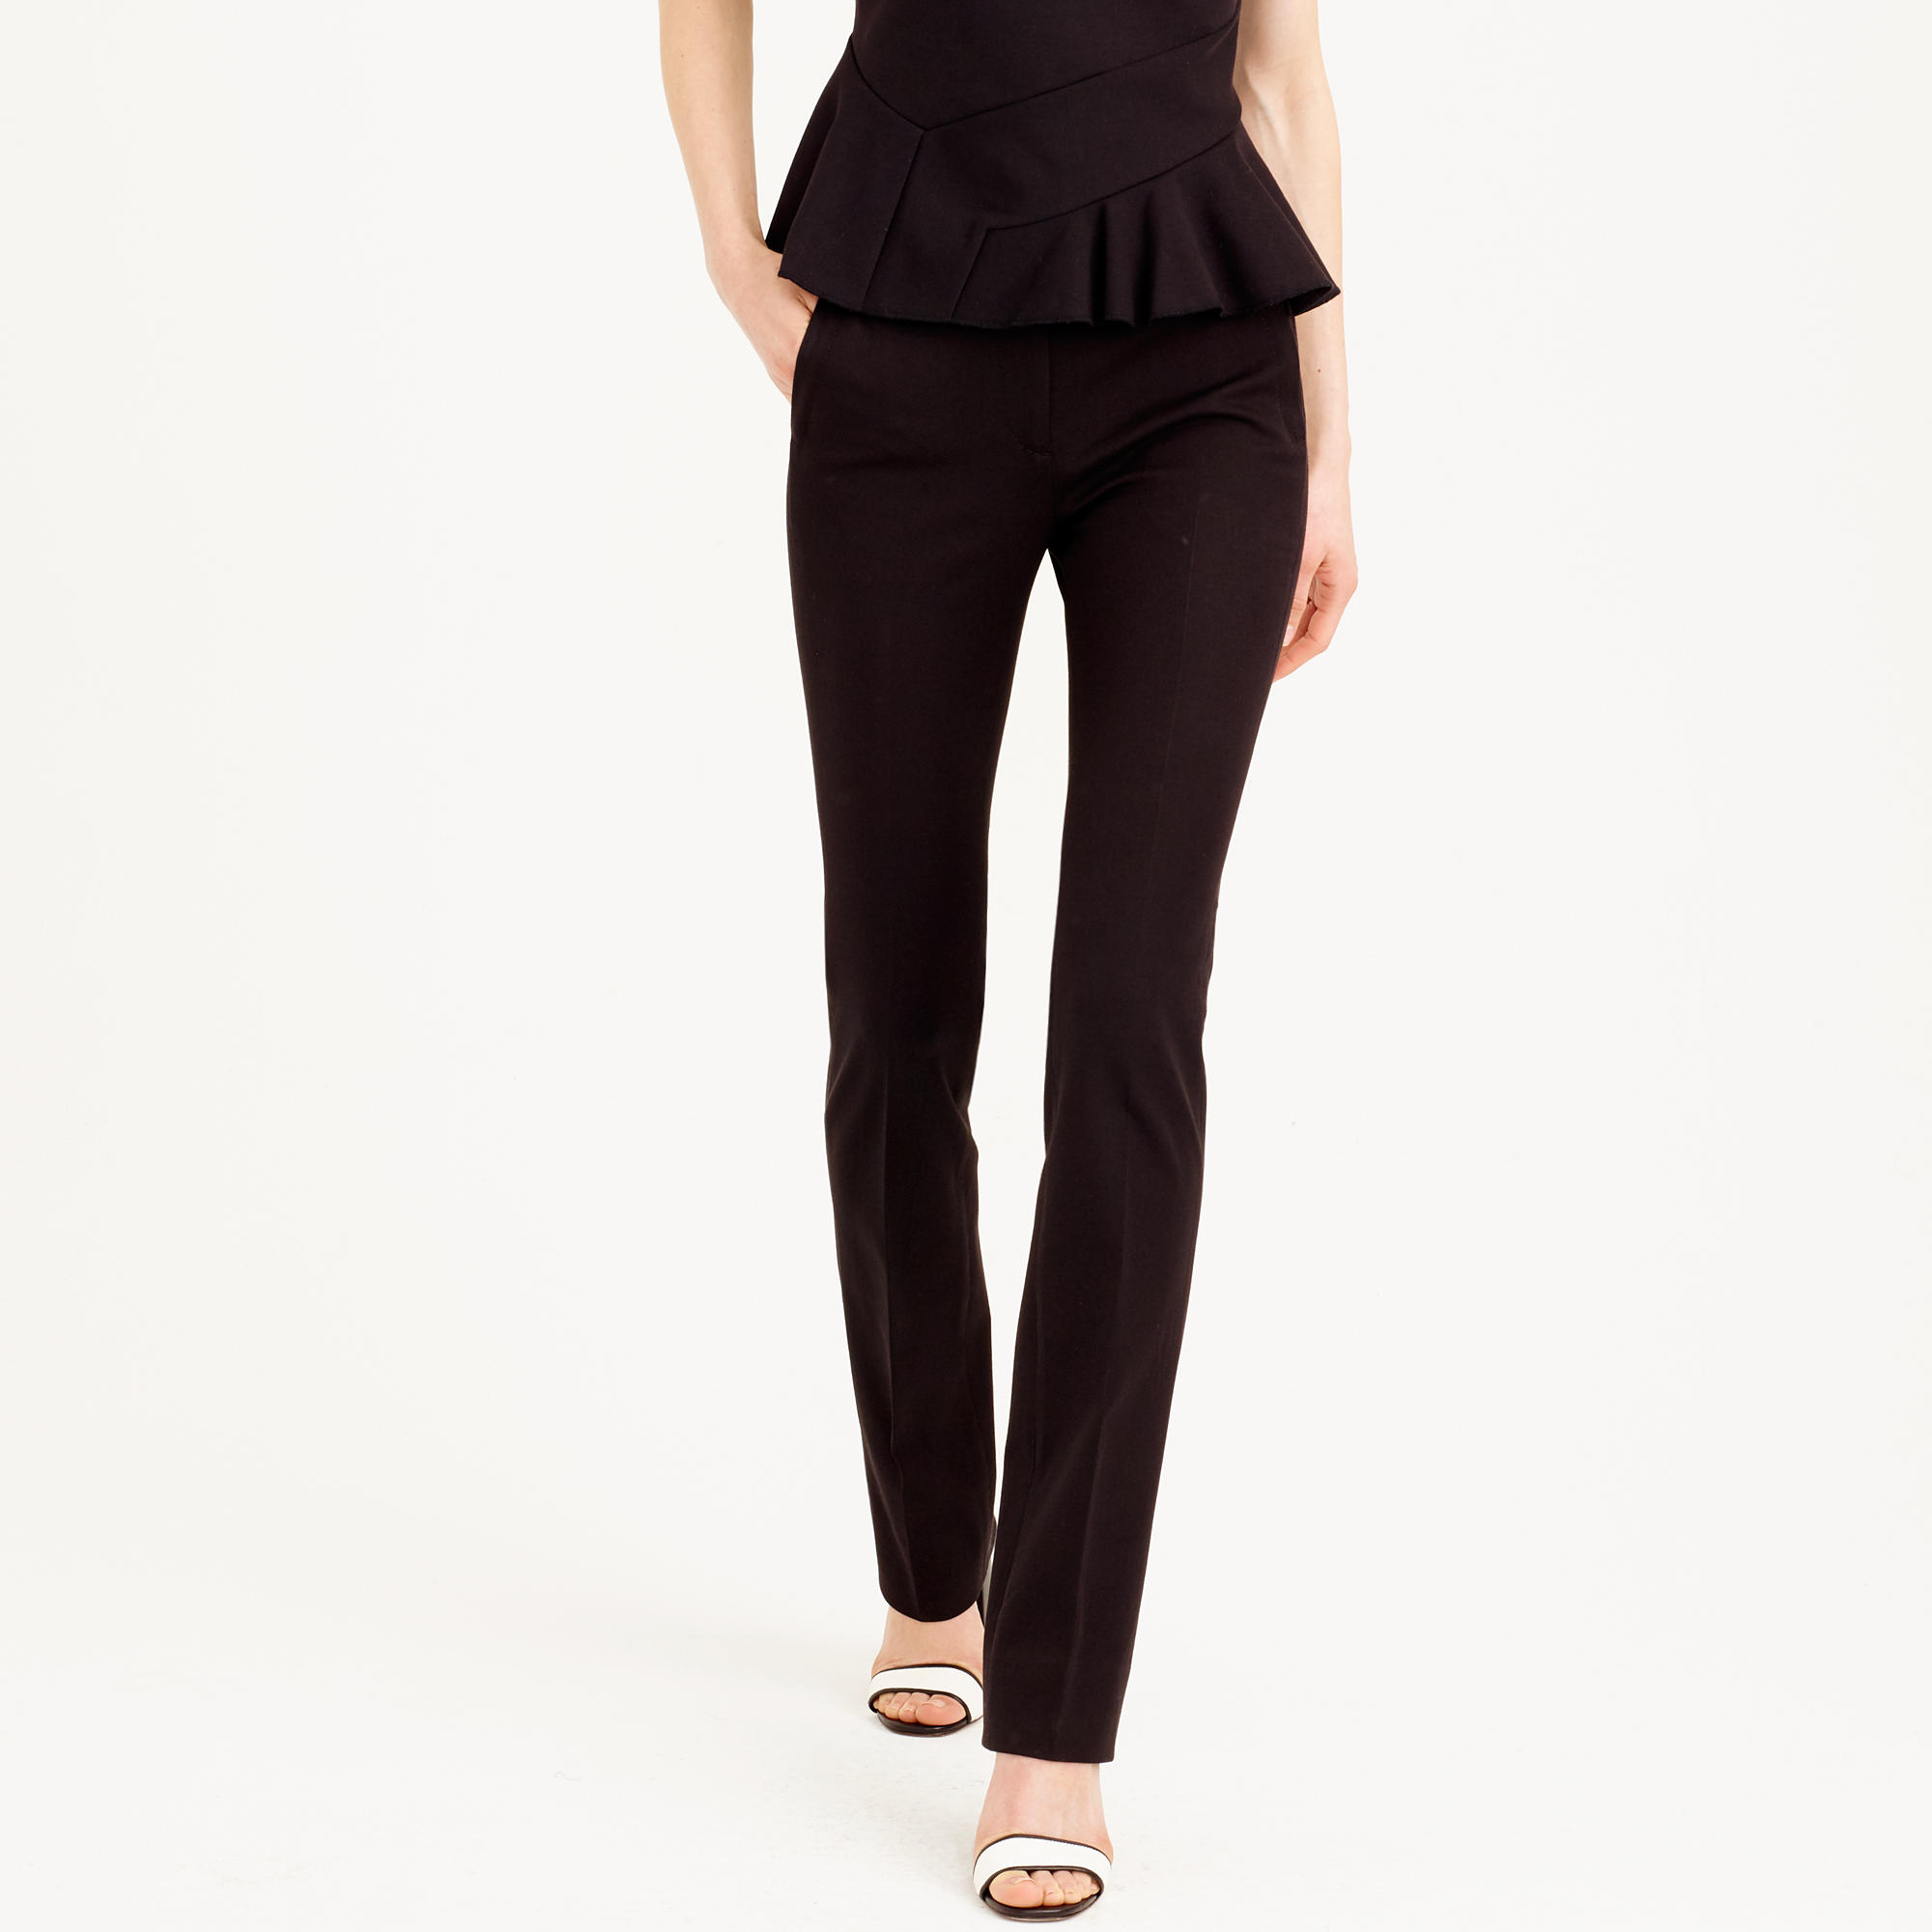 Cotton Dress Pants For Women